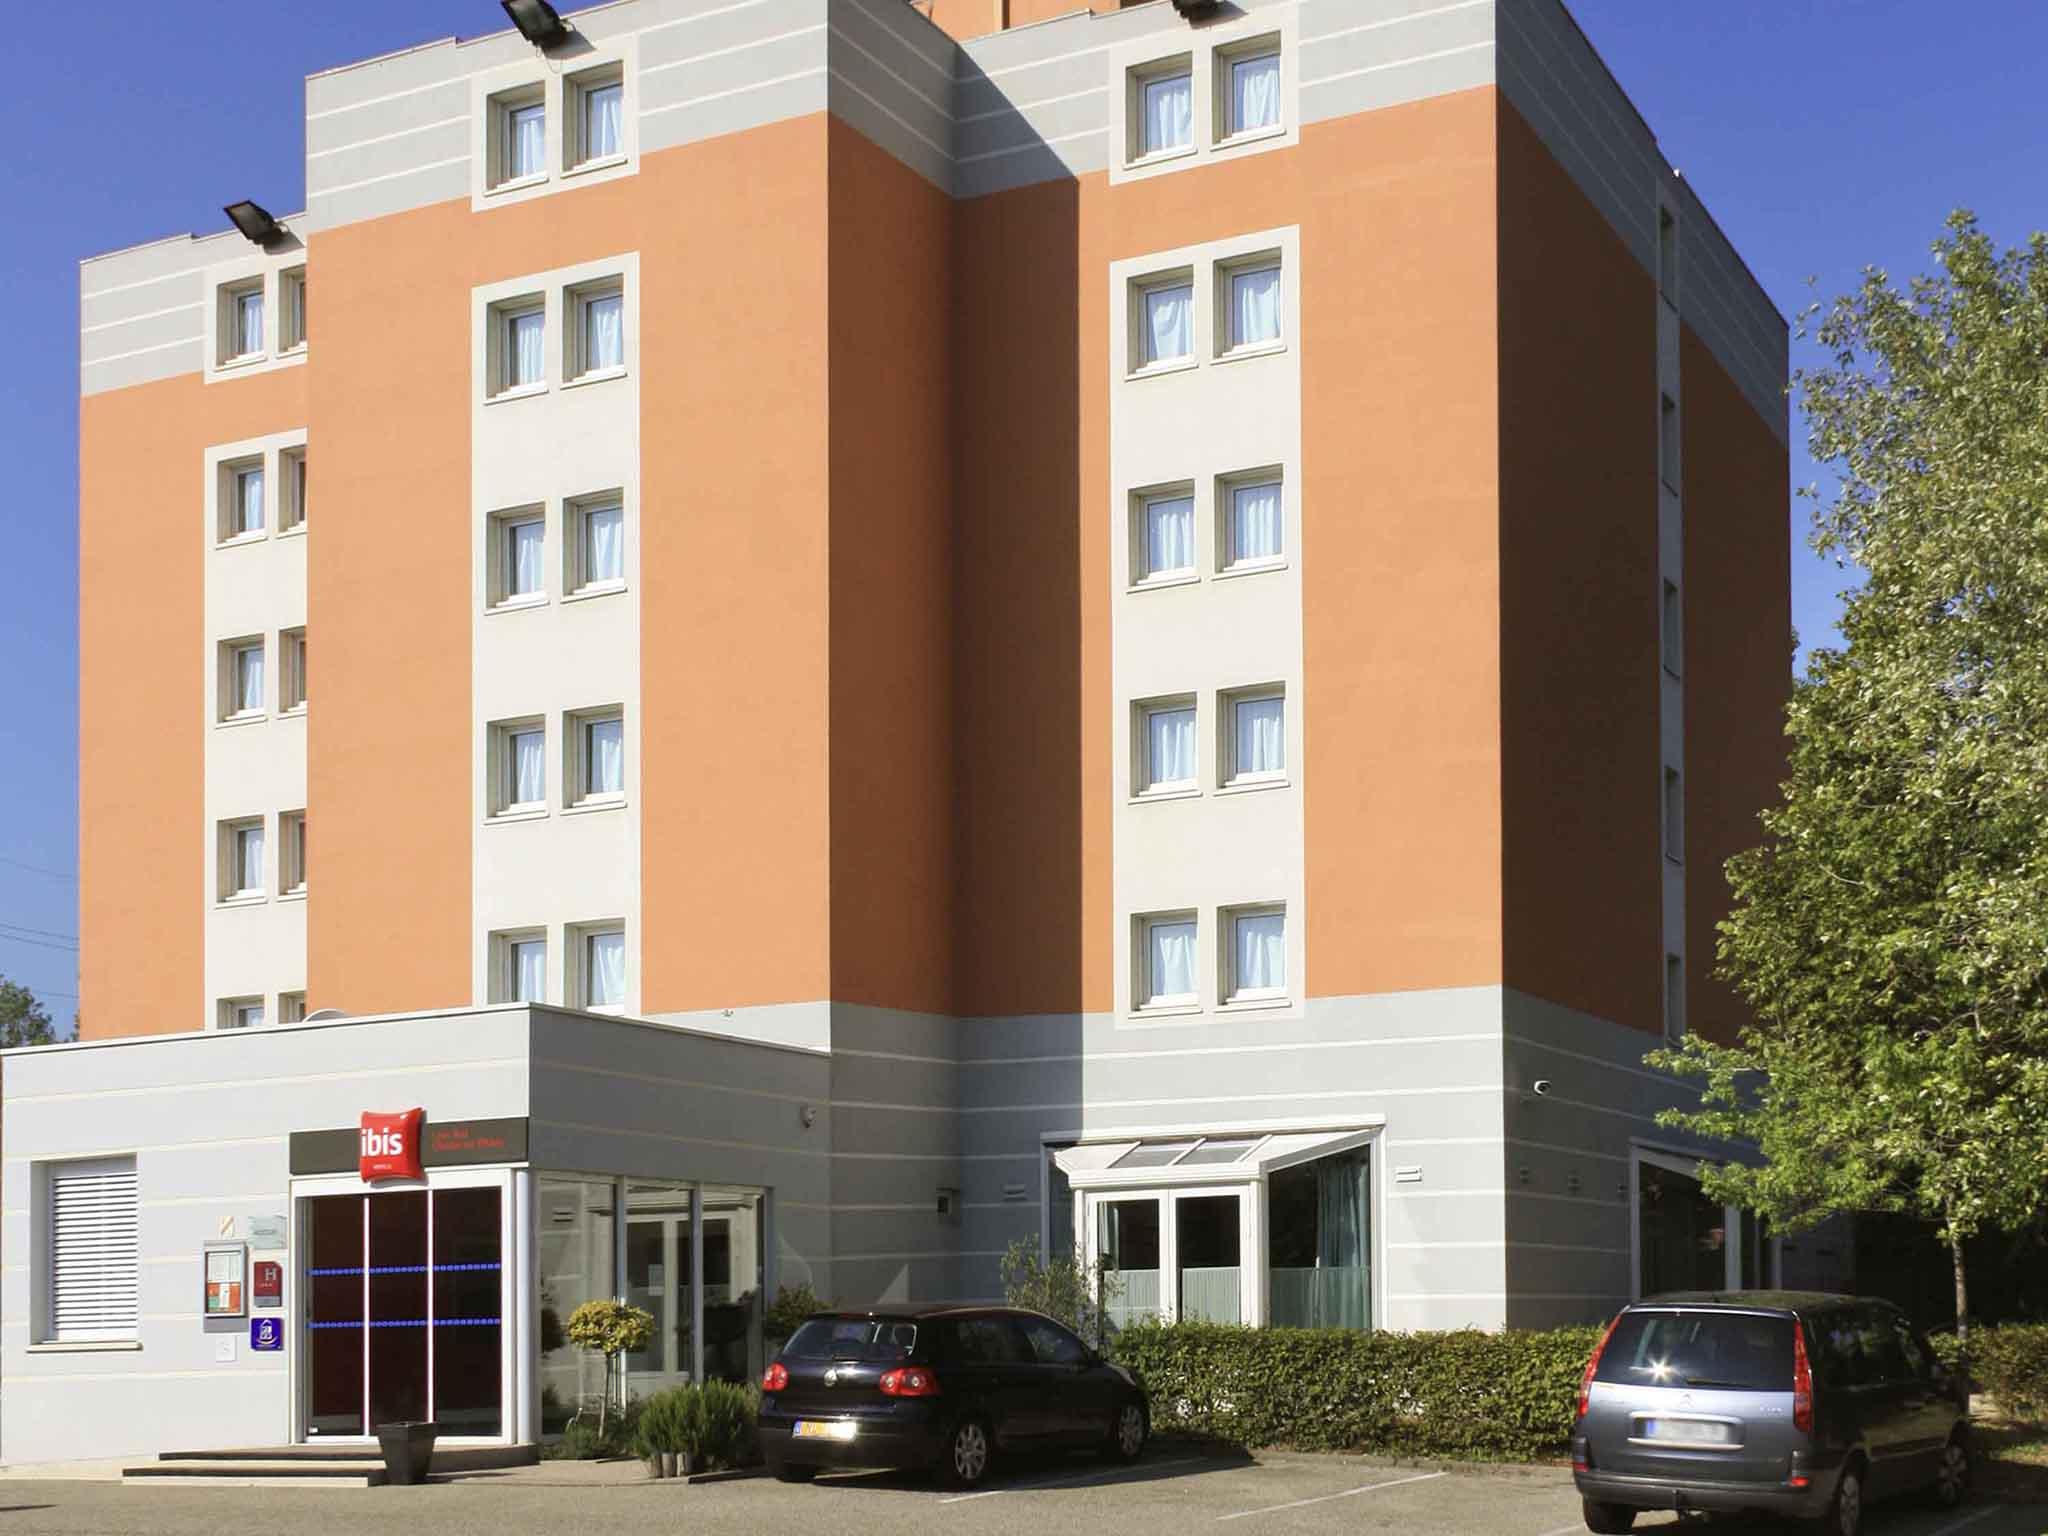 hotel a chasse sur rhone ibis lyon sud chasse sur rhone. Black Bedroom Furniture Sets. Home Design Ideas